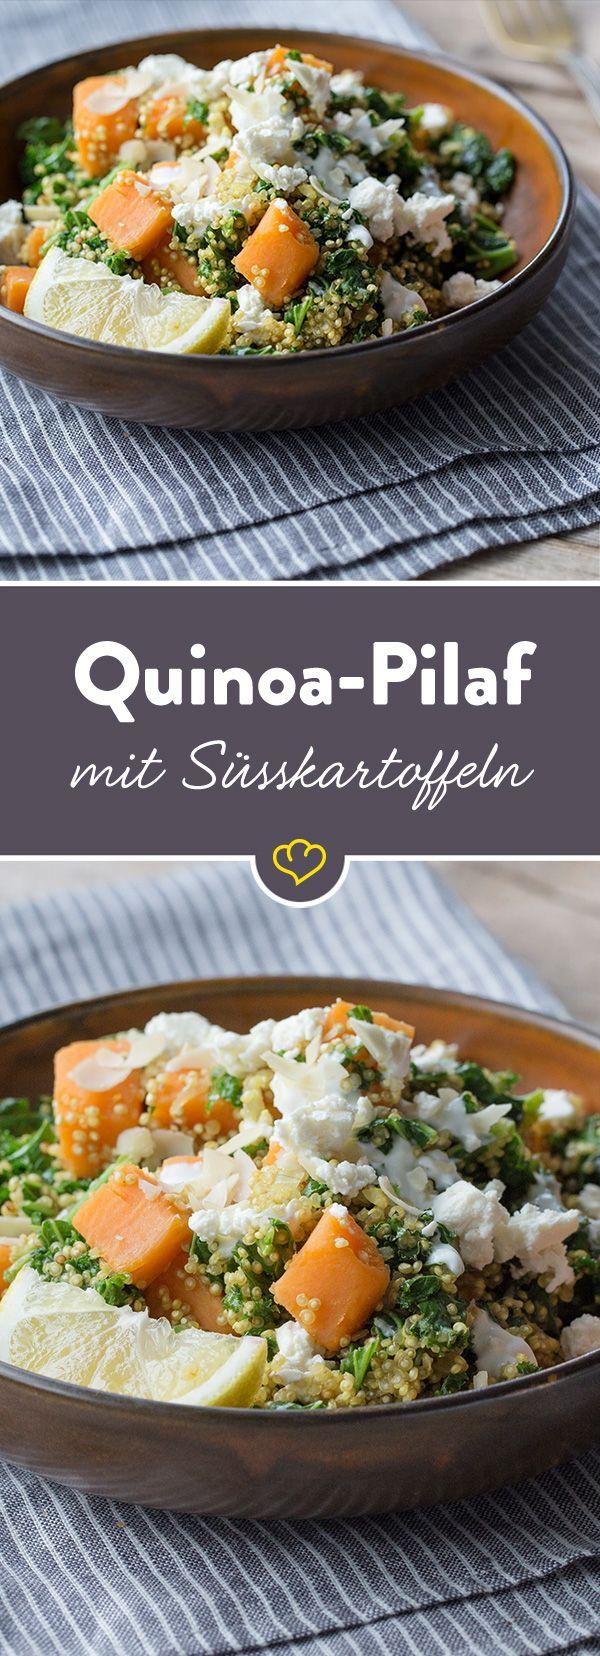 quinoa pilaf mit gr nkohl und s kartoffeln rezept healthy food besser leben gr nkohl. Black Bedroom Furniture Sets. Home Design Ideas